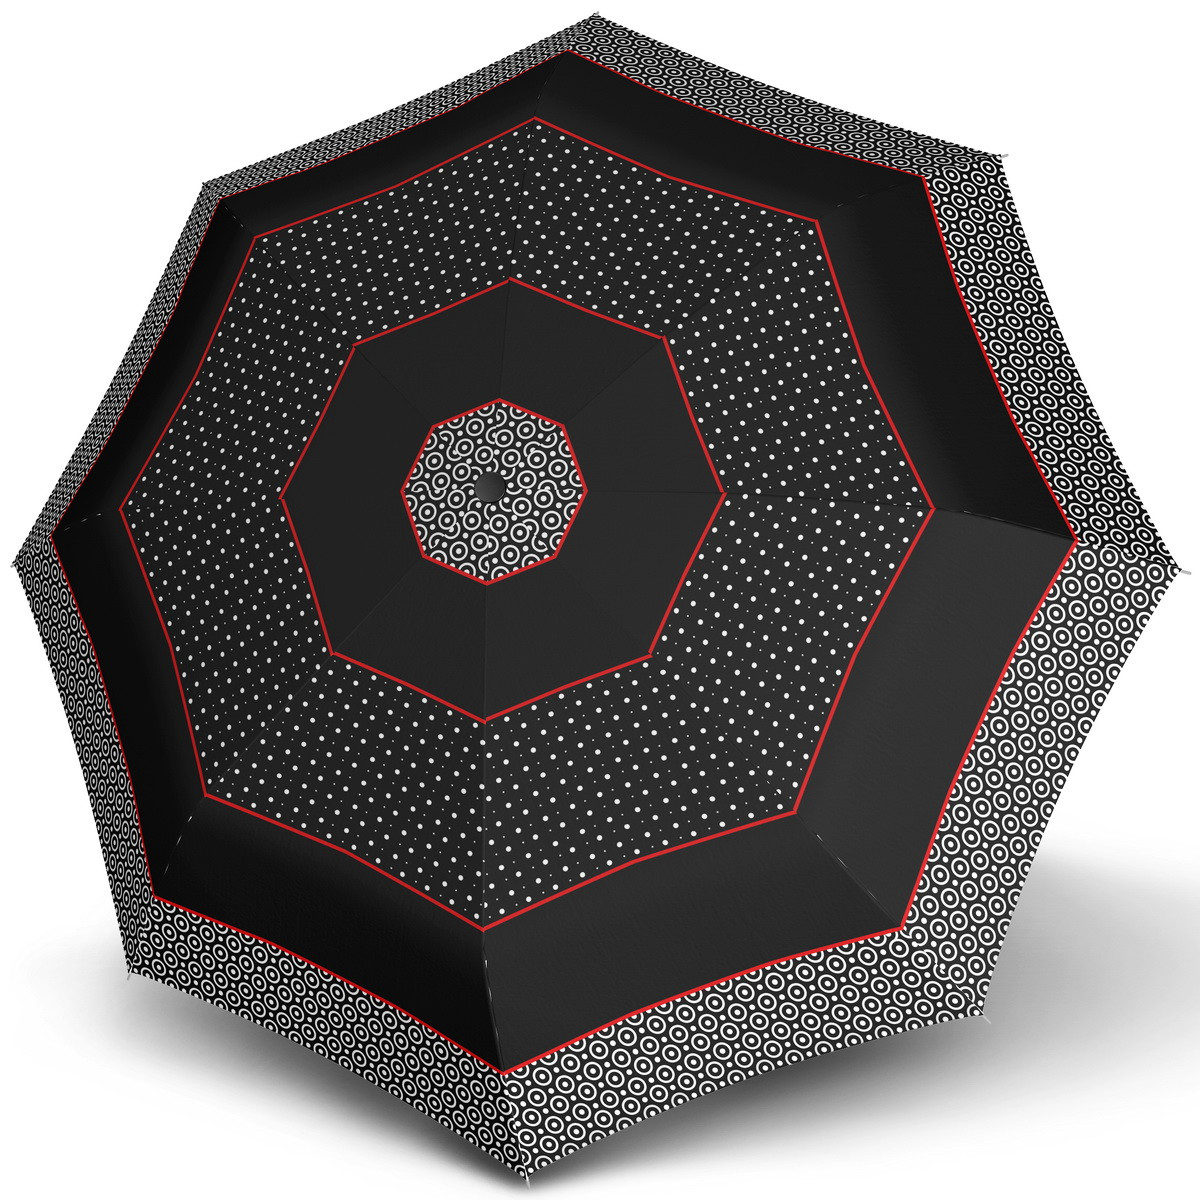 Зонт Doppler 744165PL-3 колекція DERBY, Антиветер